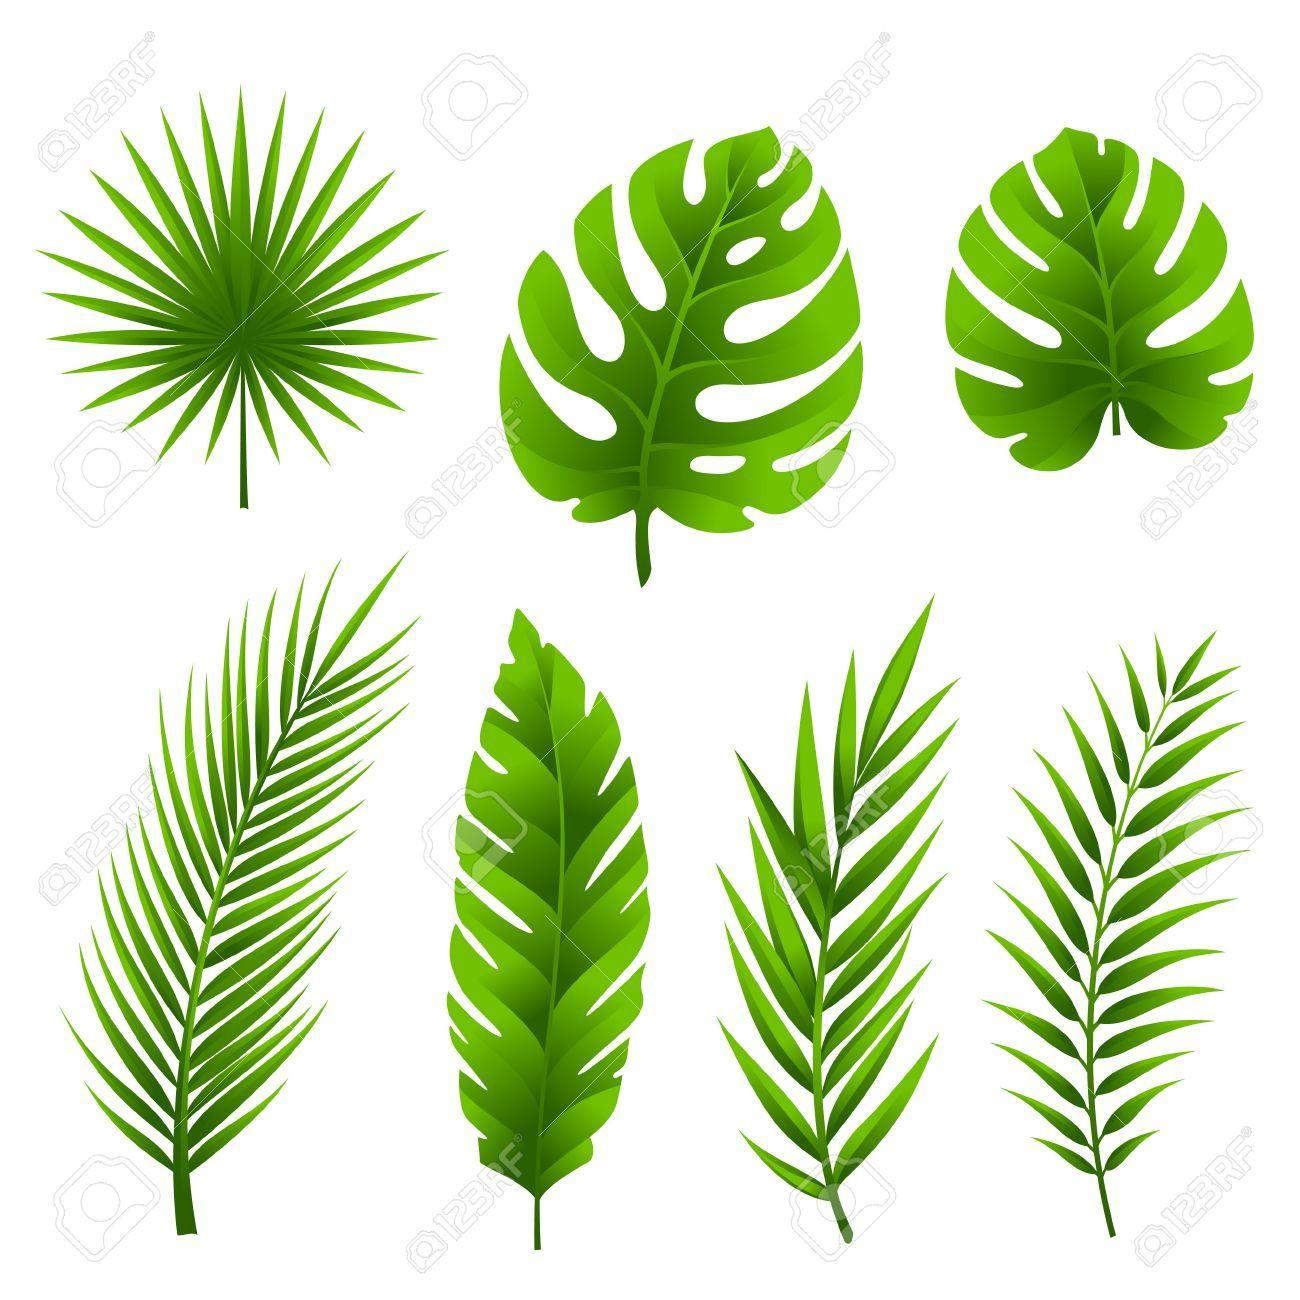 Jungle Leaves Set Tropical Palm Tree Leaves Collection Palm Tree Drawing Leaf Drawing Palm Tree Vector